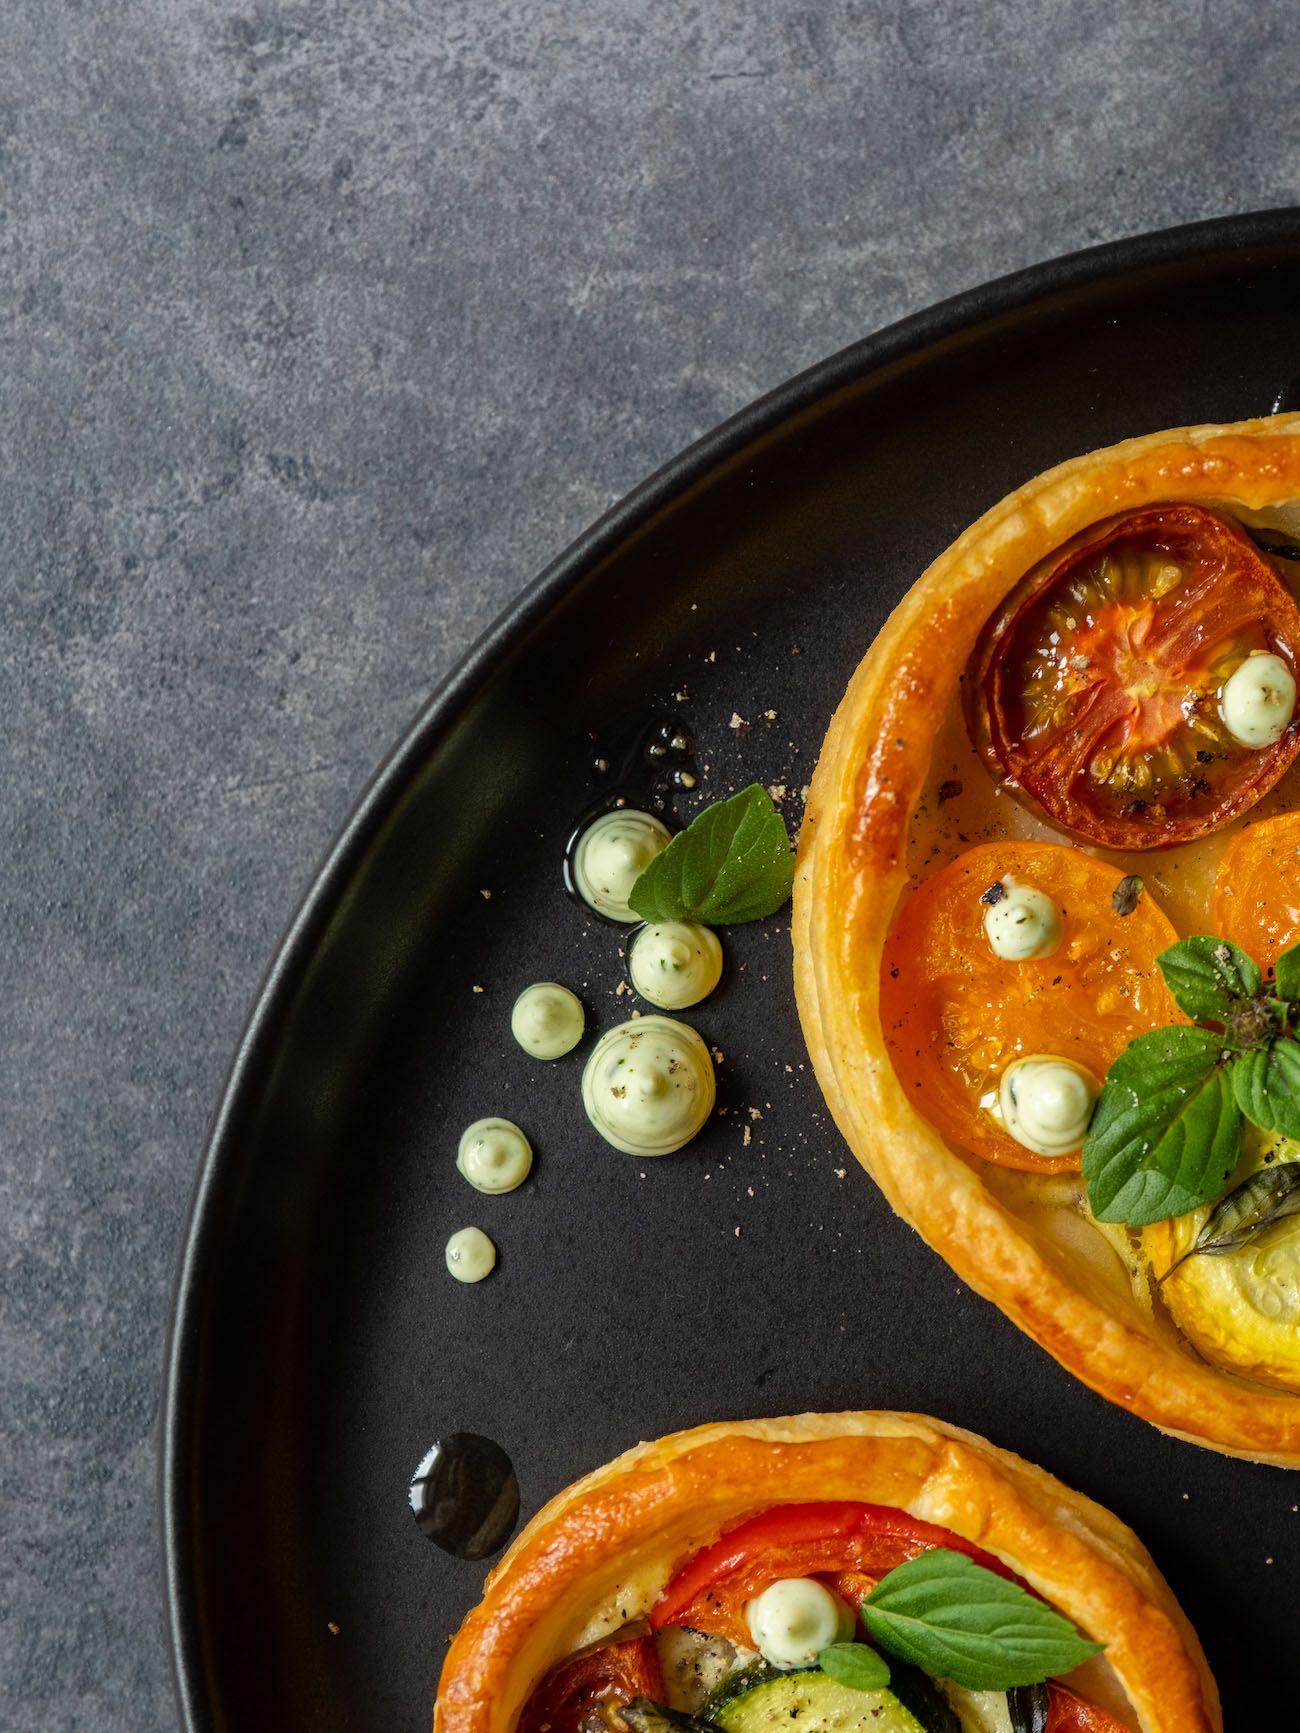 Rezept, Foodblog, About Fuel, Tomaten Zucchini Tartelettes mit Basilikum Feta Creme, Olivenöl